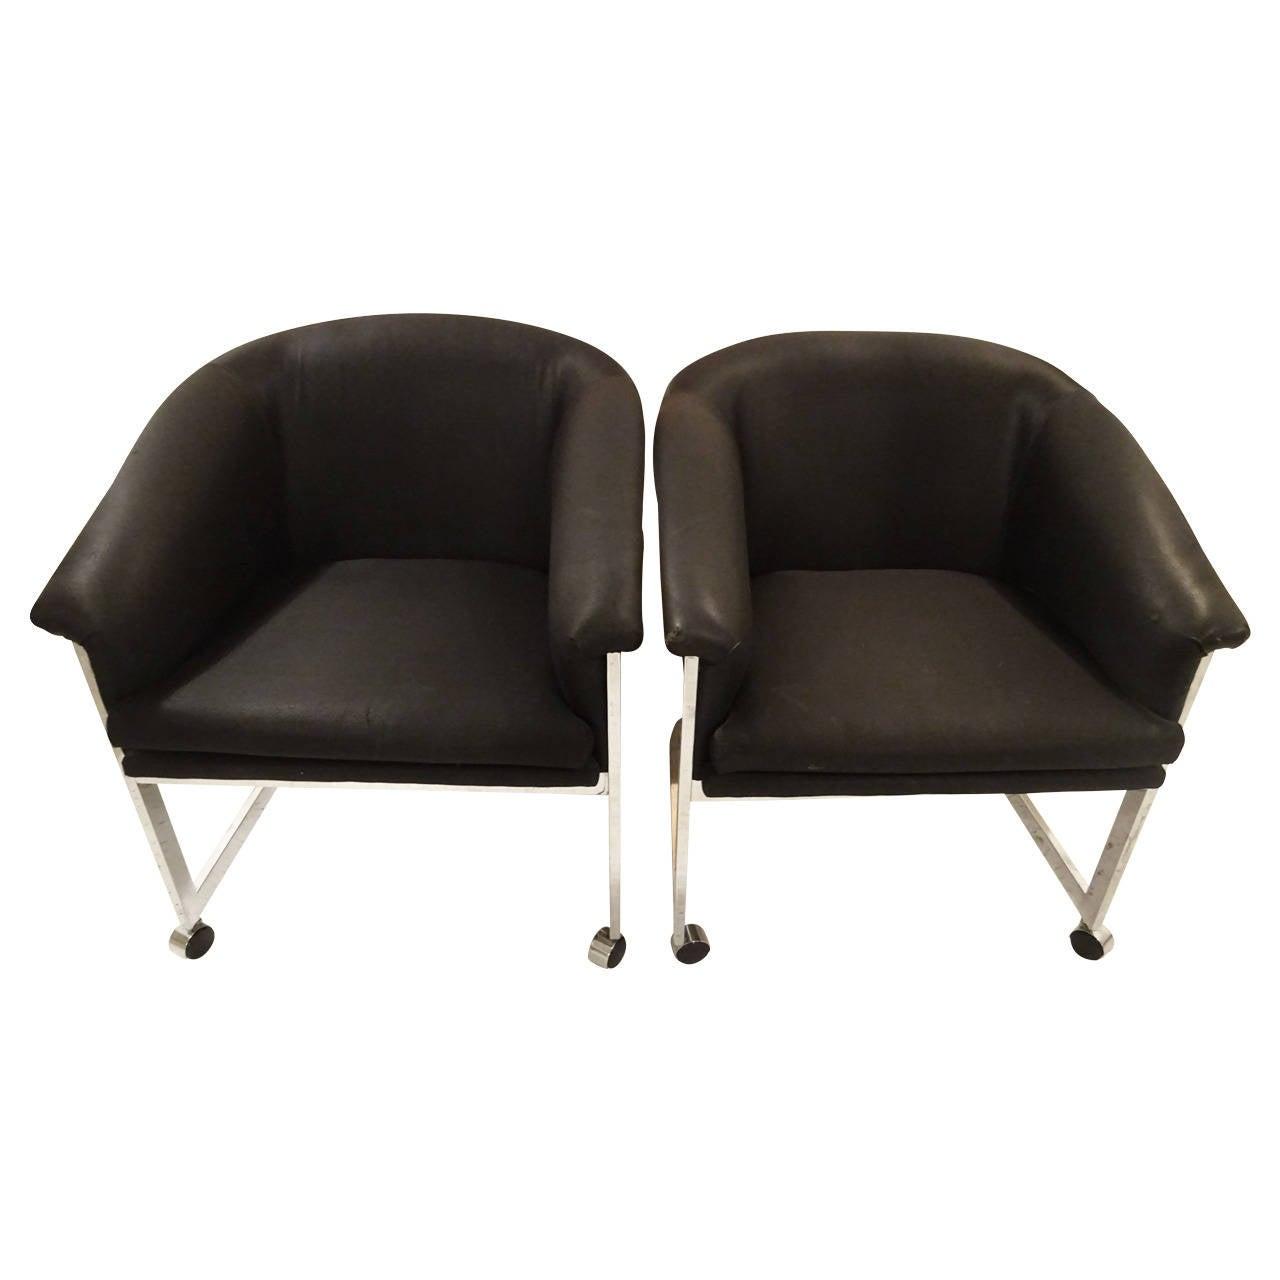 Milo Baughman Style Club Chairs At 1stdibs